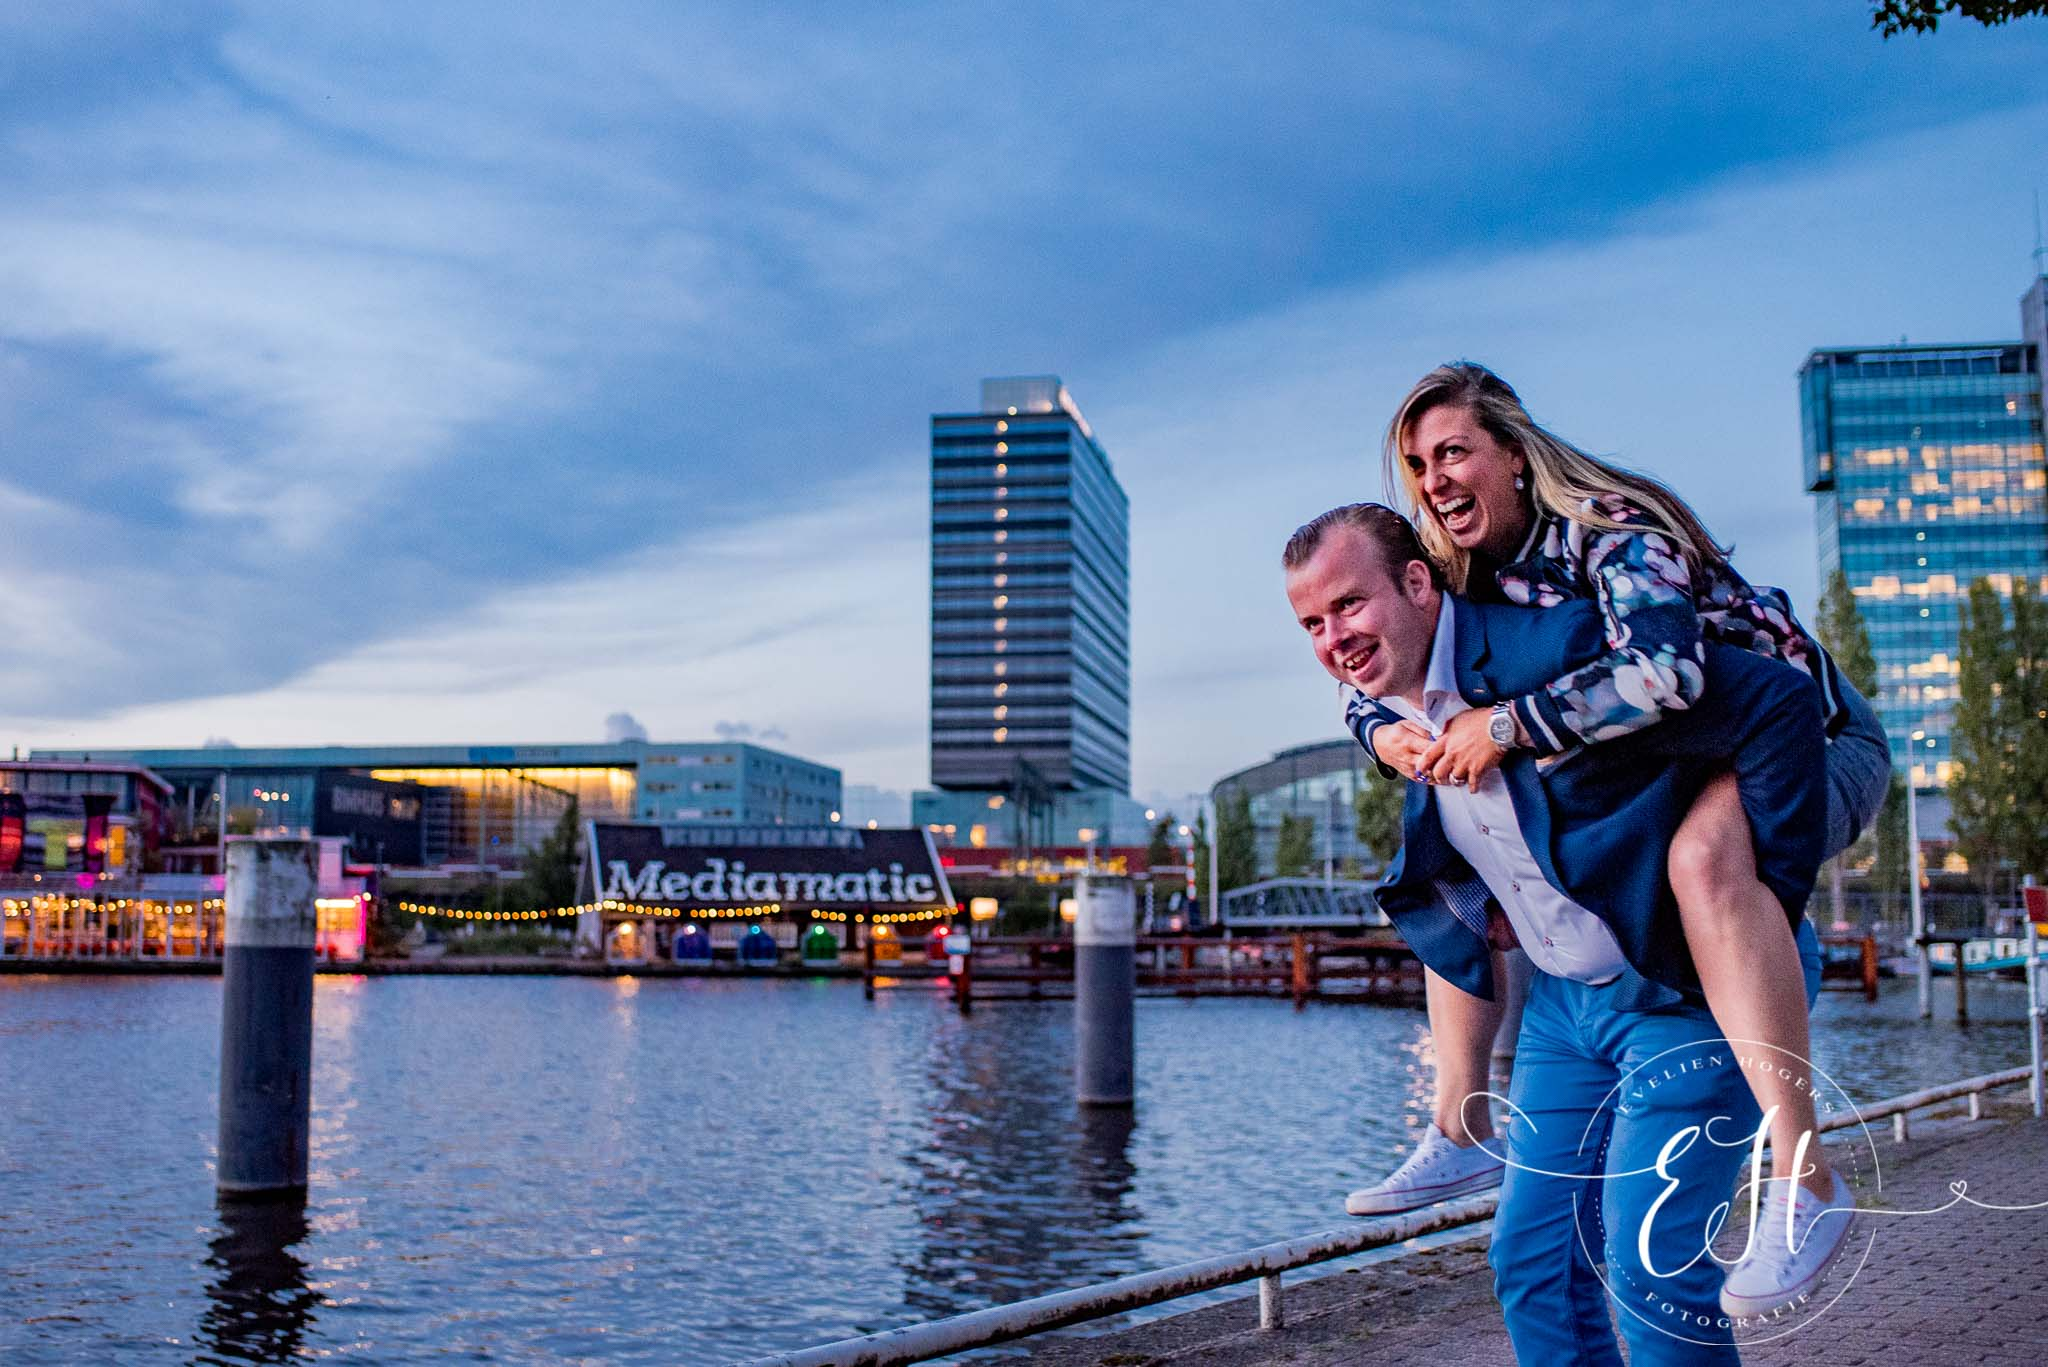 loveshoot-in-amsterdam-evelien-hogers-fotografie (20 van 26).jpg